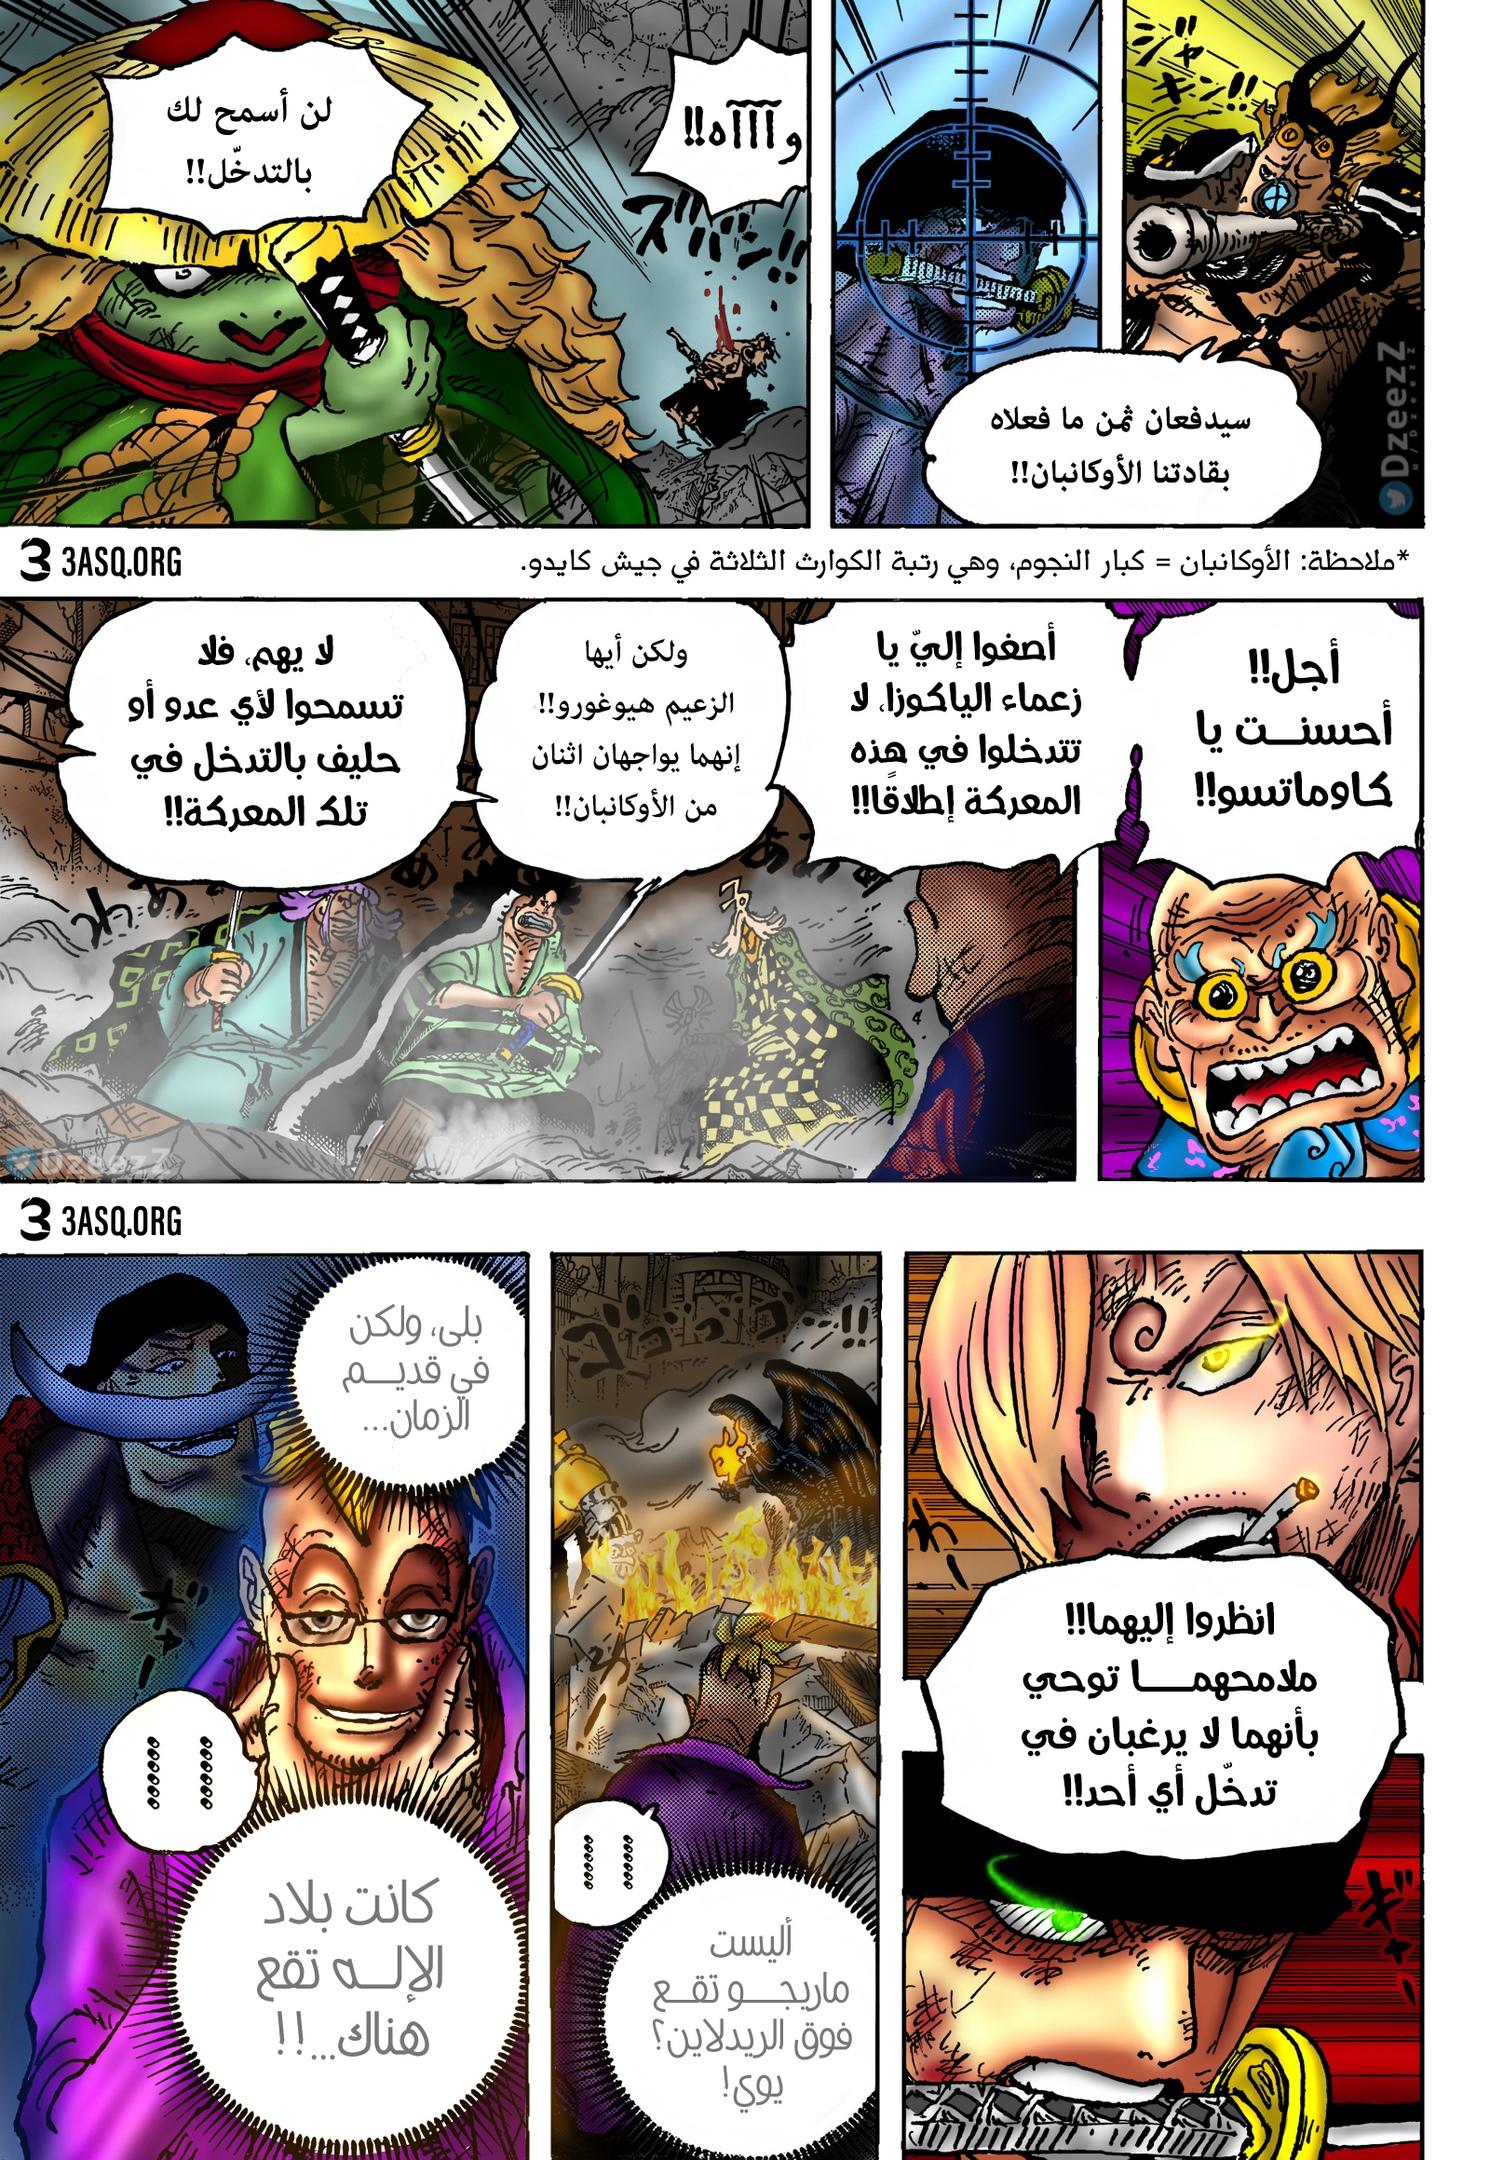 One Piece Arab 1023, image №24